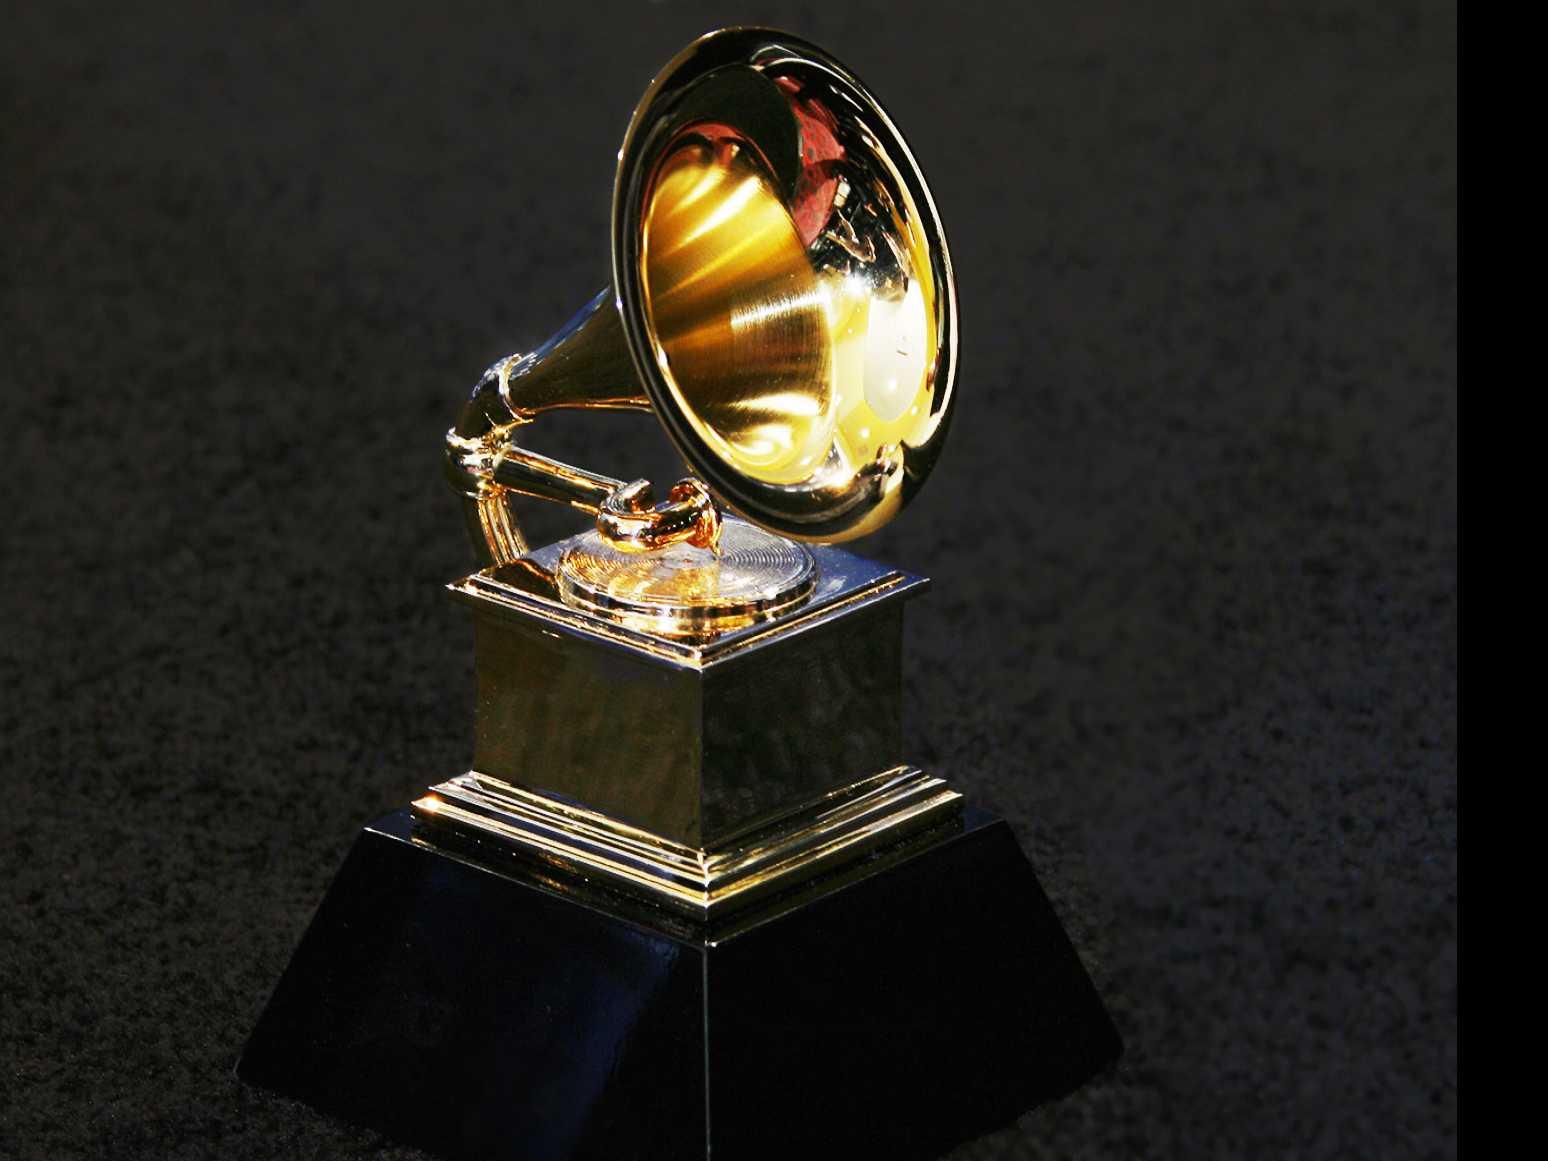 Grammys Defends Itself About Women Representation